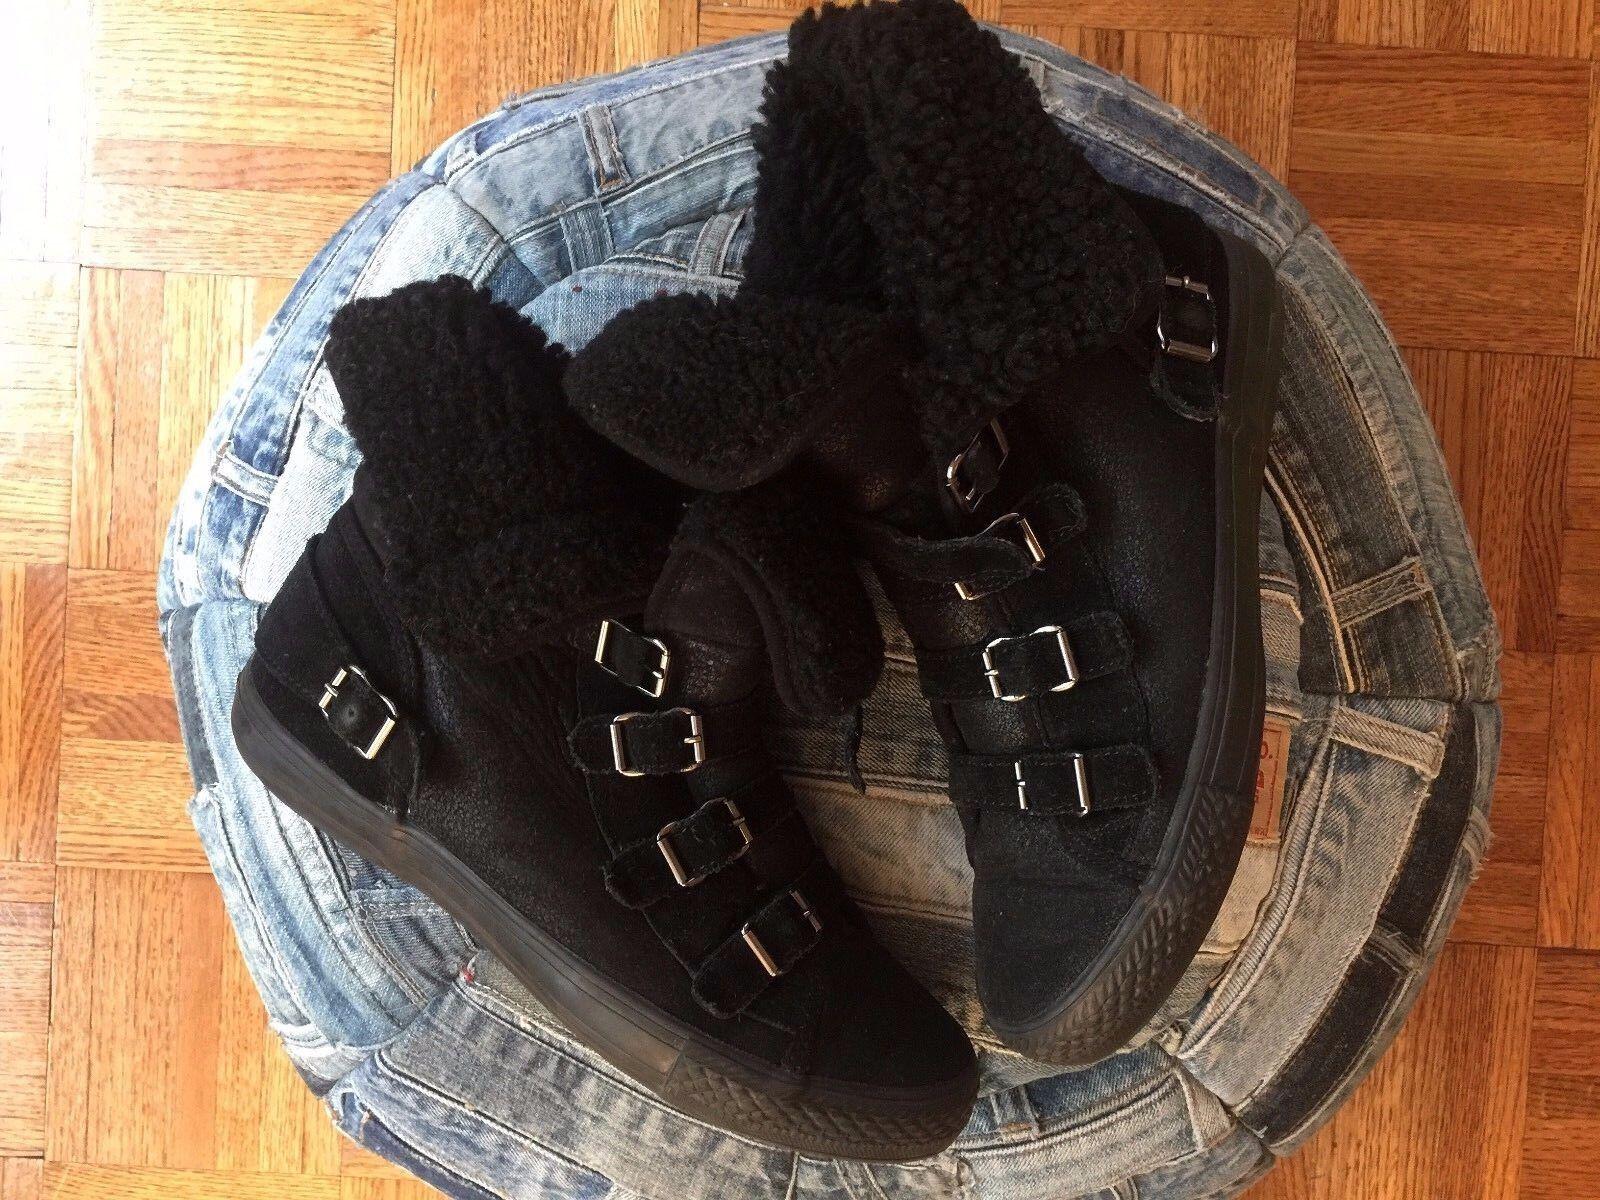 ASH VISBY Noir Suede Shearling Femme Designer High Top Top Top Sneakers 7 EUR 38 cc9434